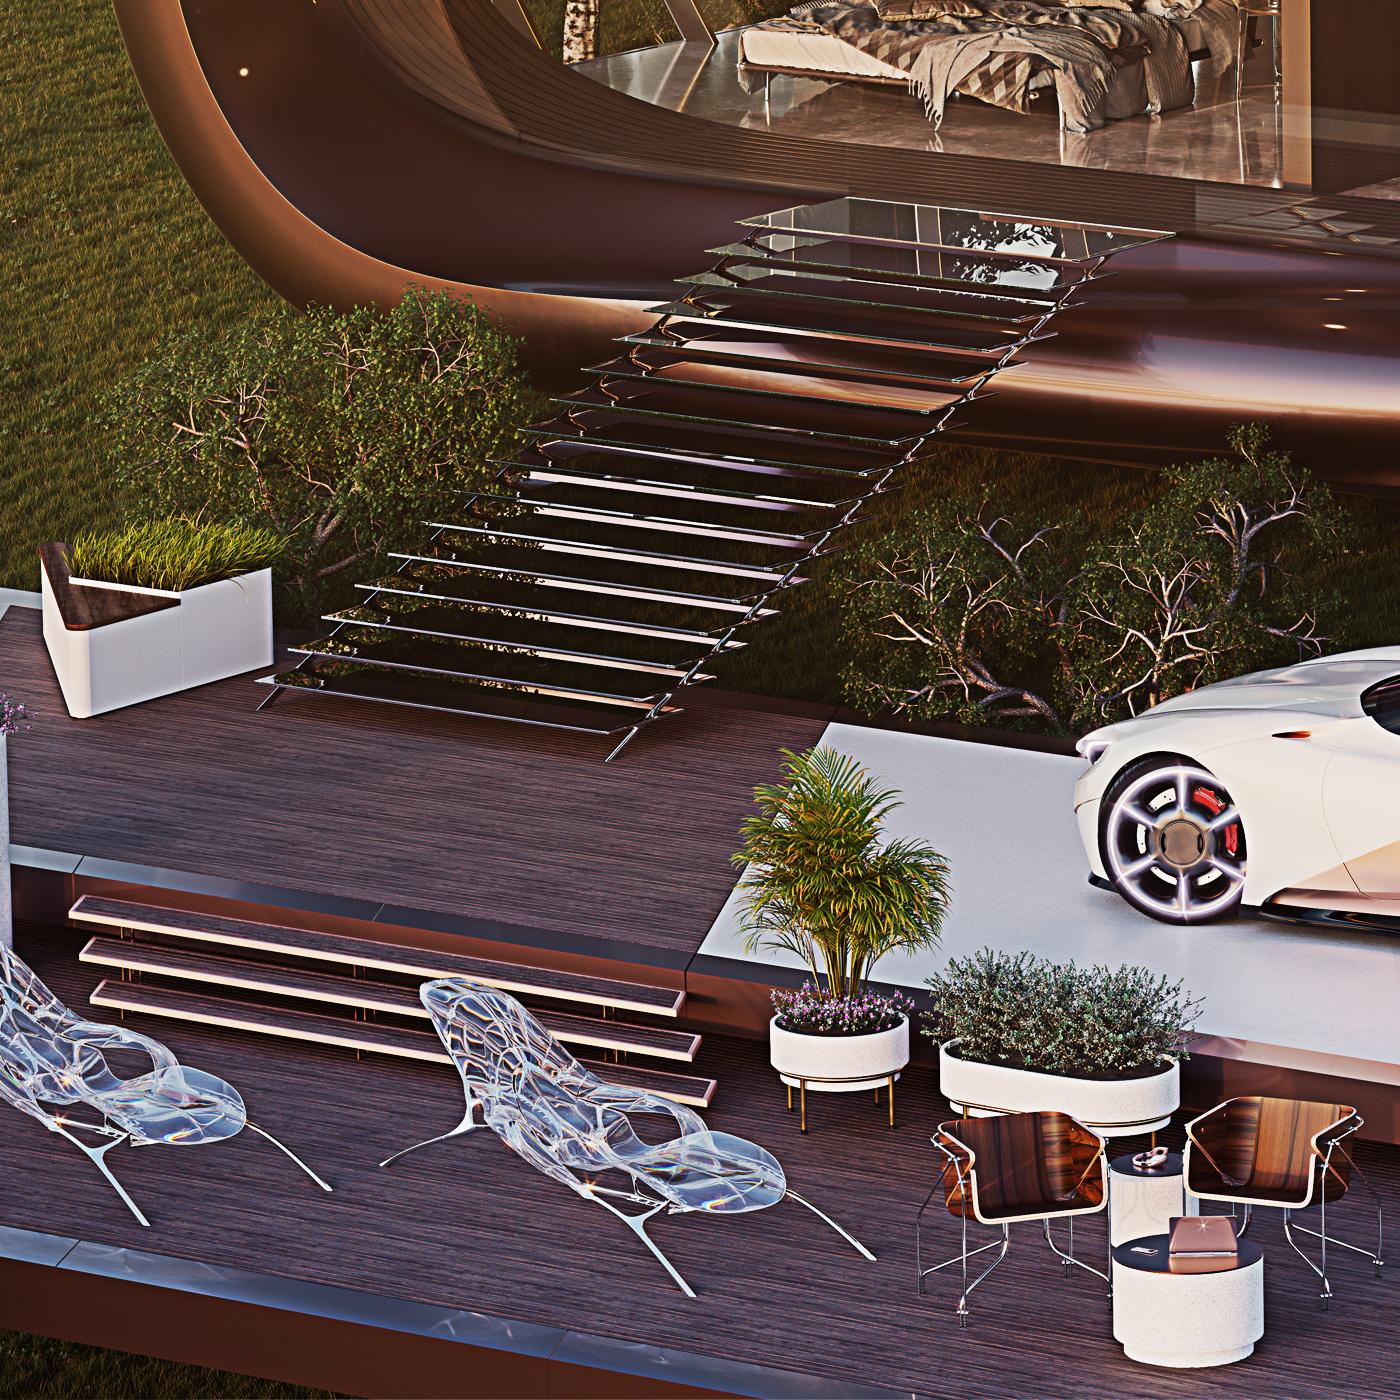 Module house futuristic luxury architecture 4.jpg